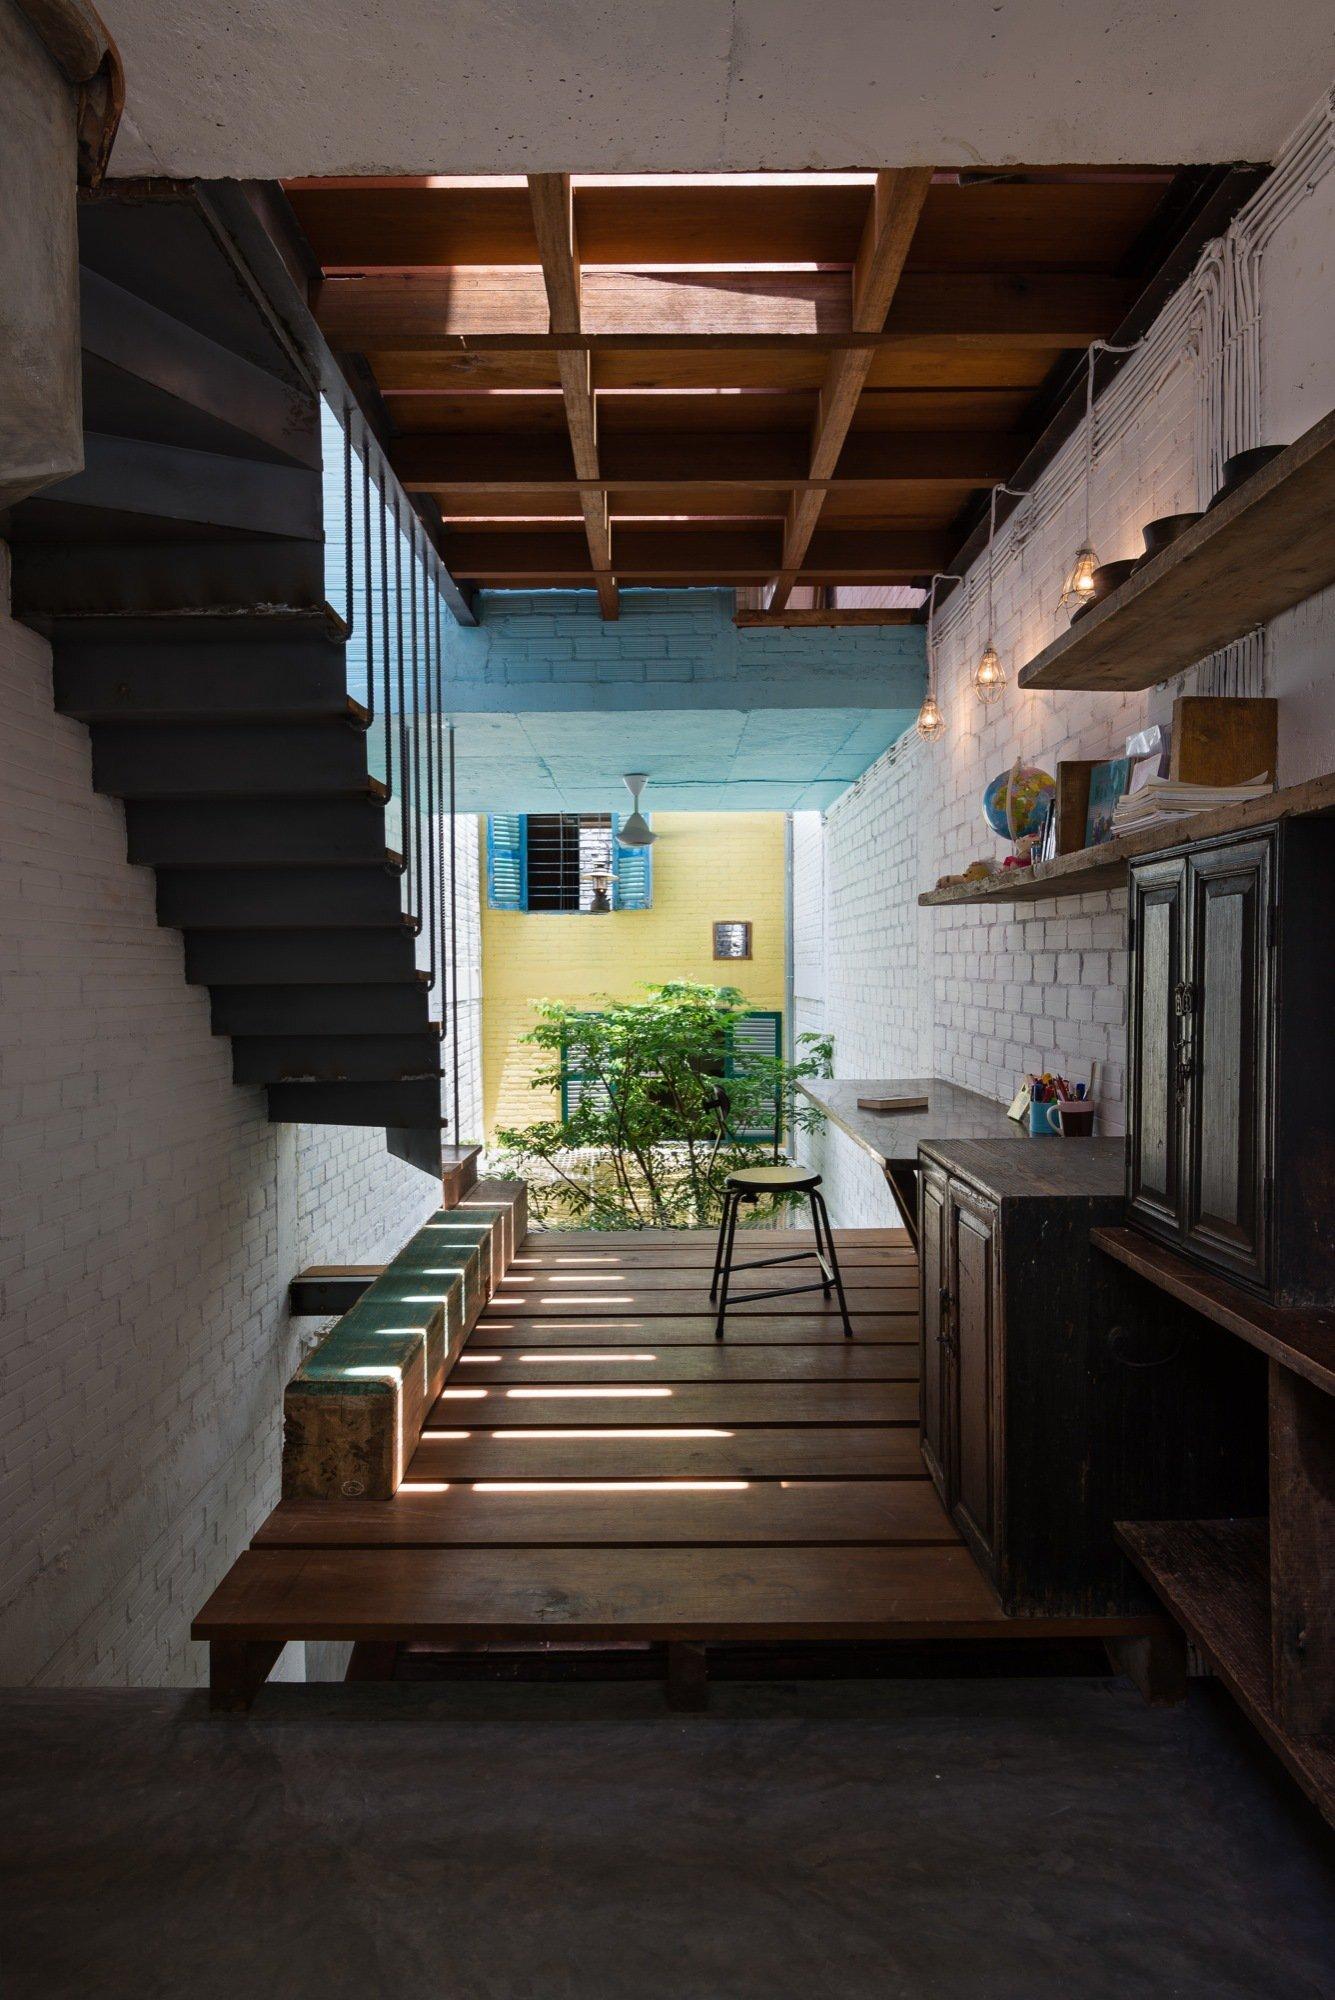 Saigon House - Small House - a21studio - Vietnam - Living Area 2 - Humble Homes